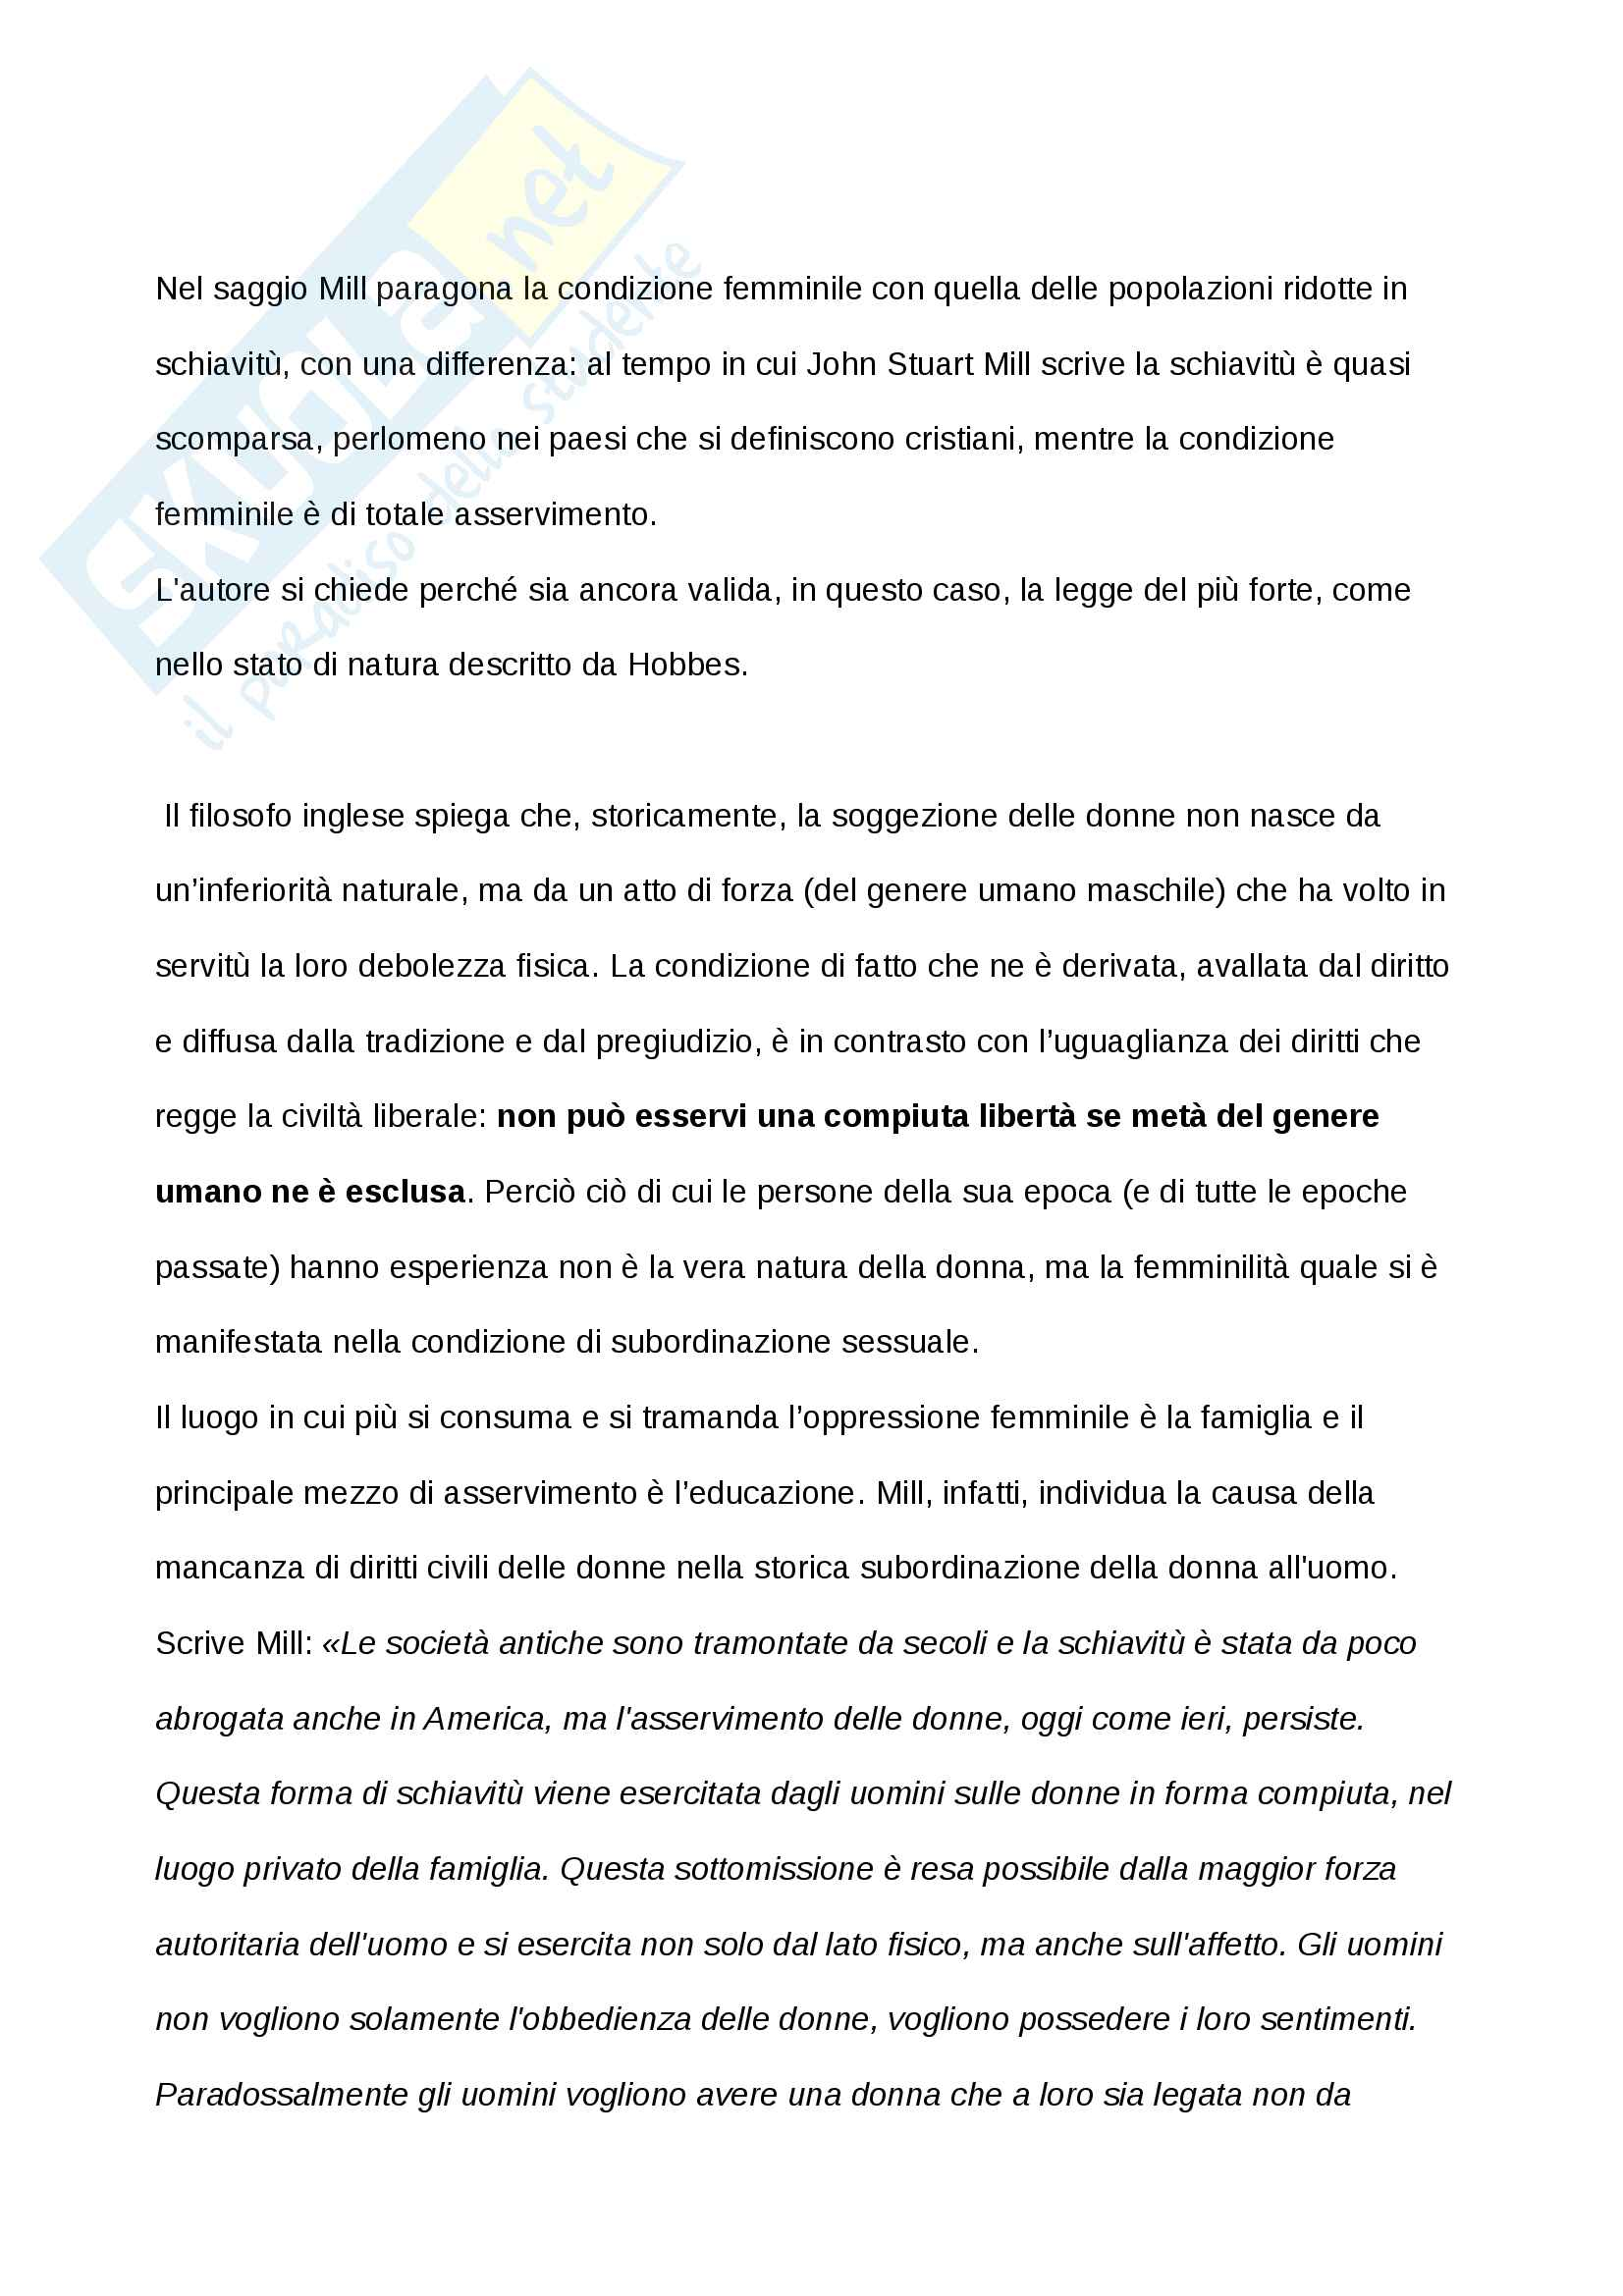 Tesina esame Prof. Di Gregorio, John Stuart Mill - L'Asservimento delle Donne Pag. 6